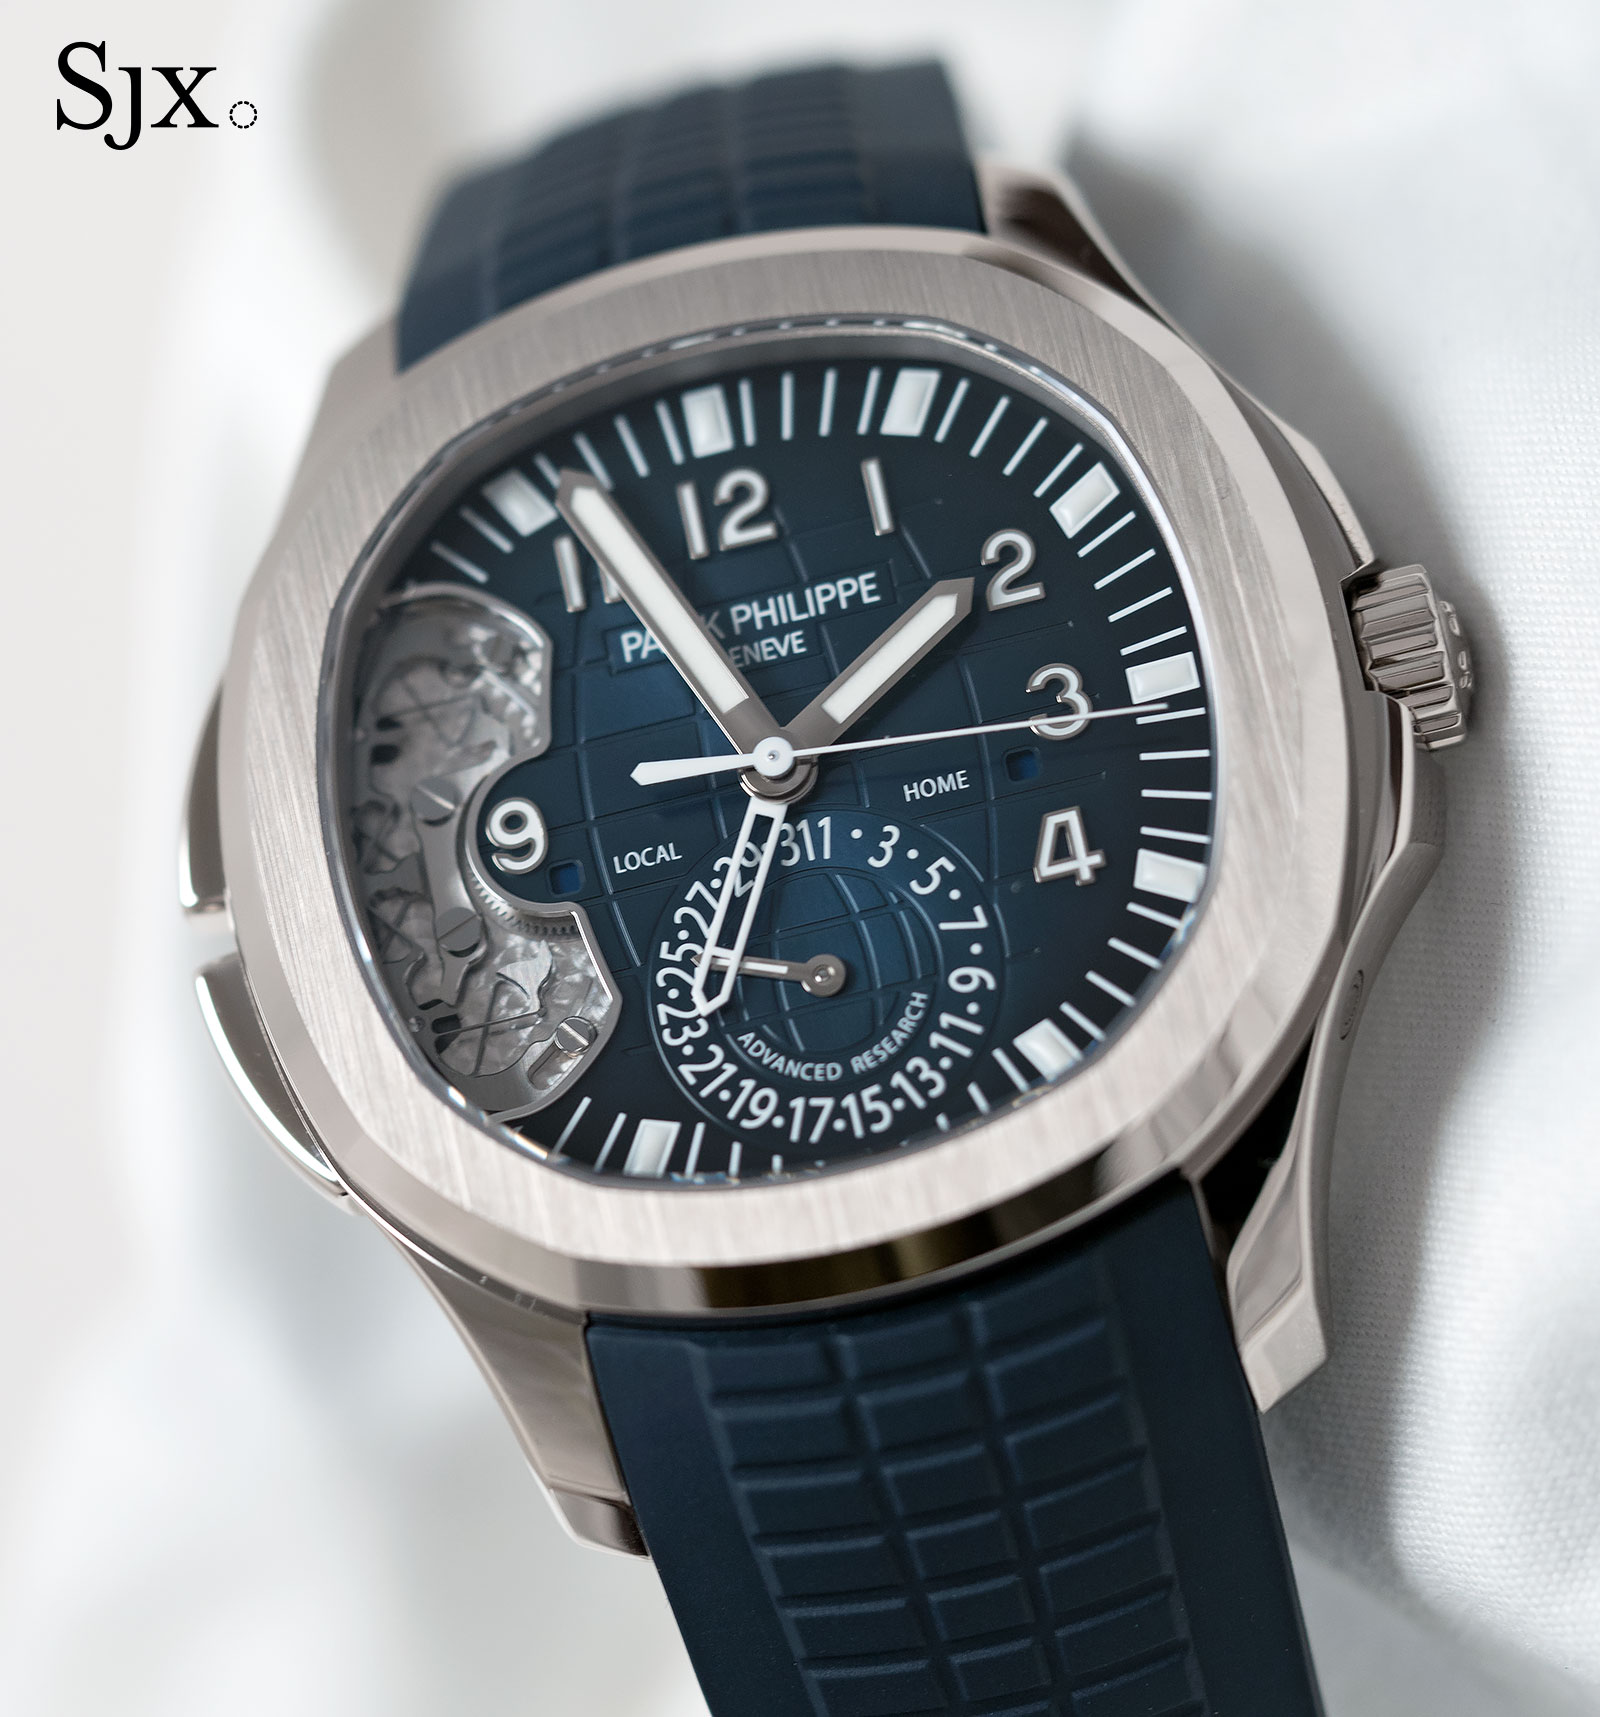 Explaining The Patek Philippe Aquanaut Travel Time Ref 5650g